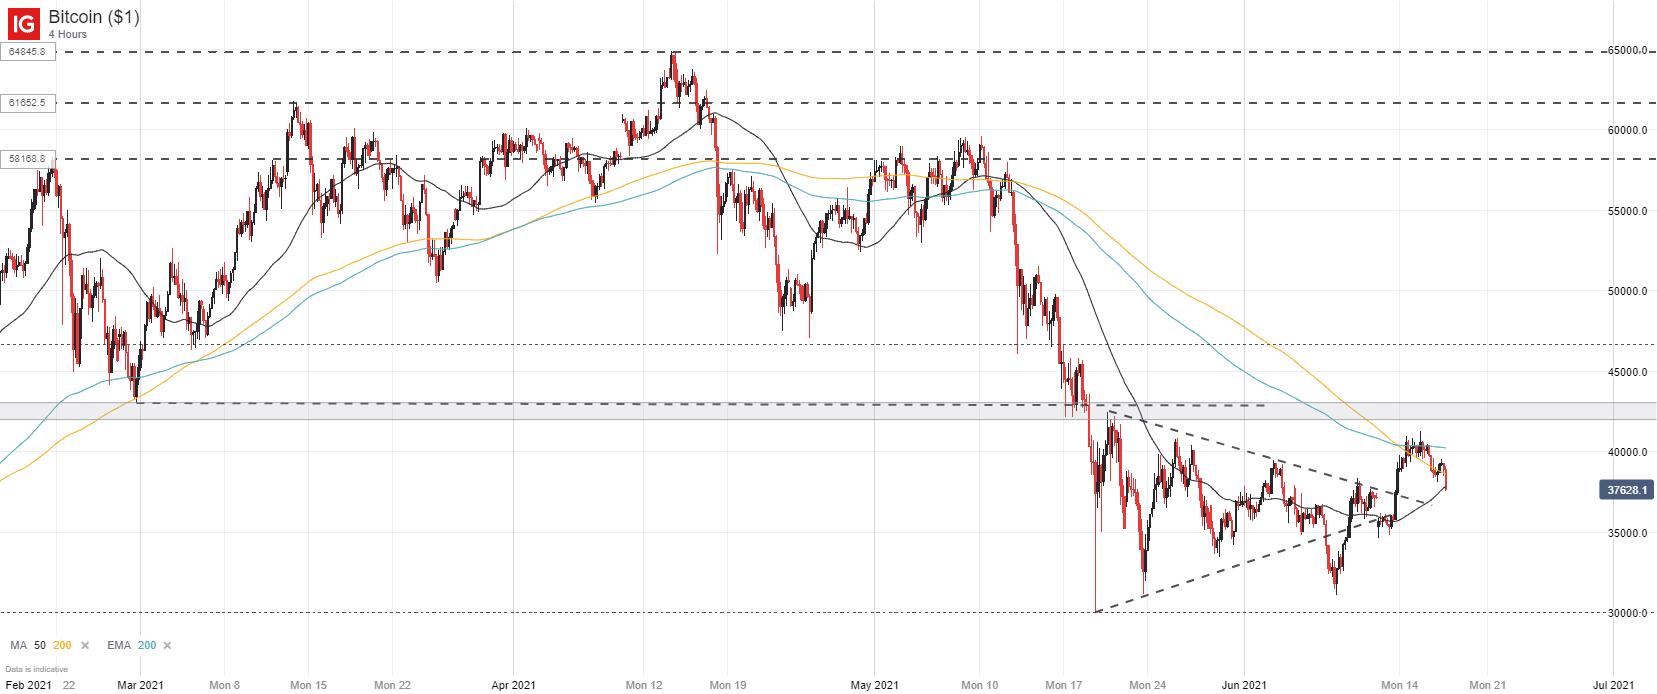 trading usd vs btc)